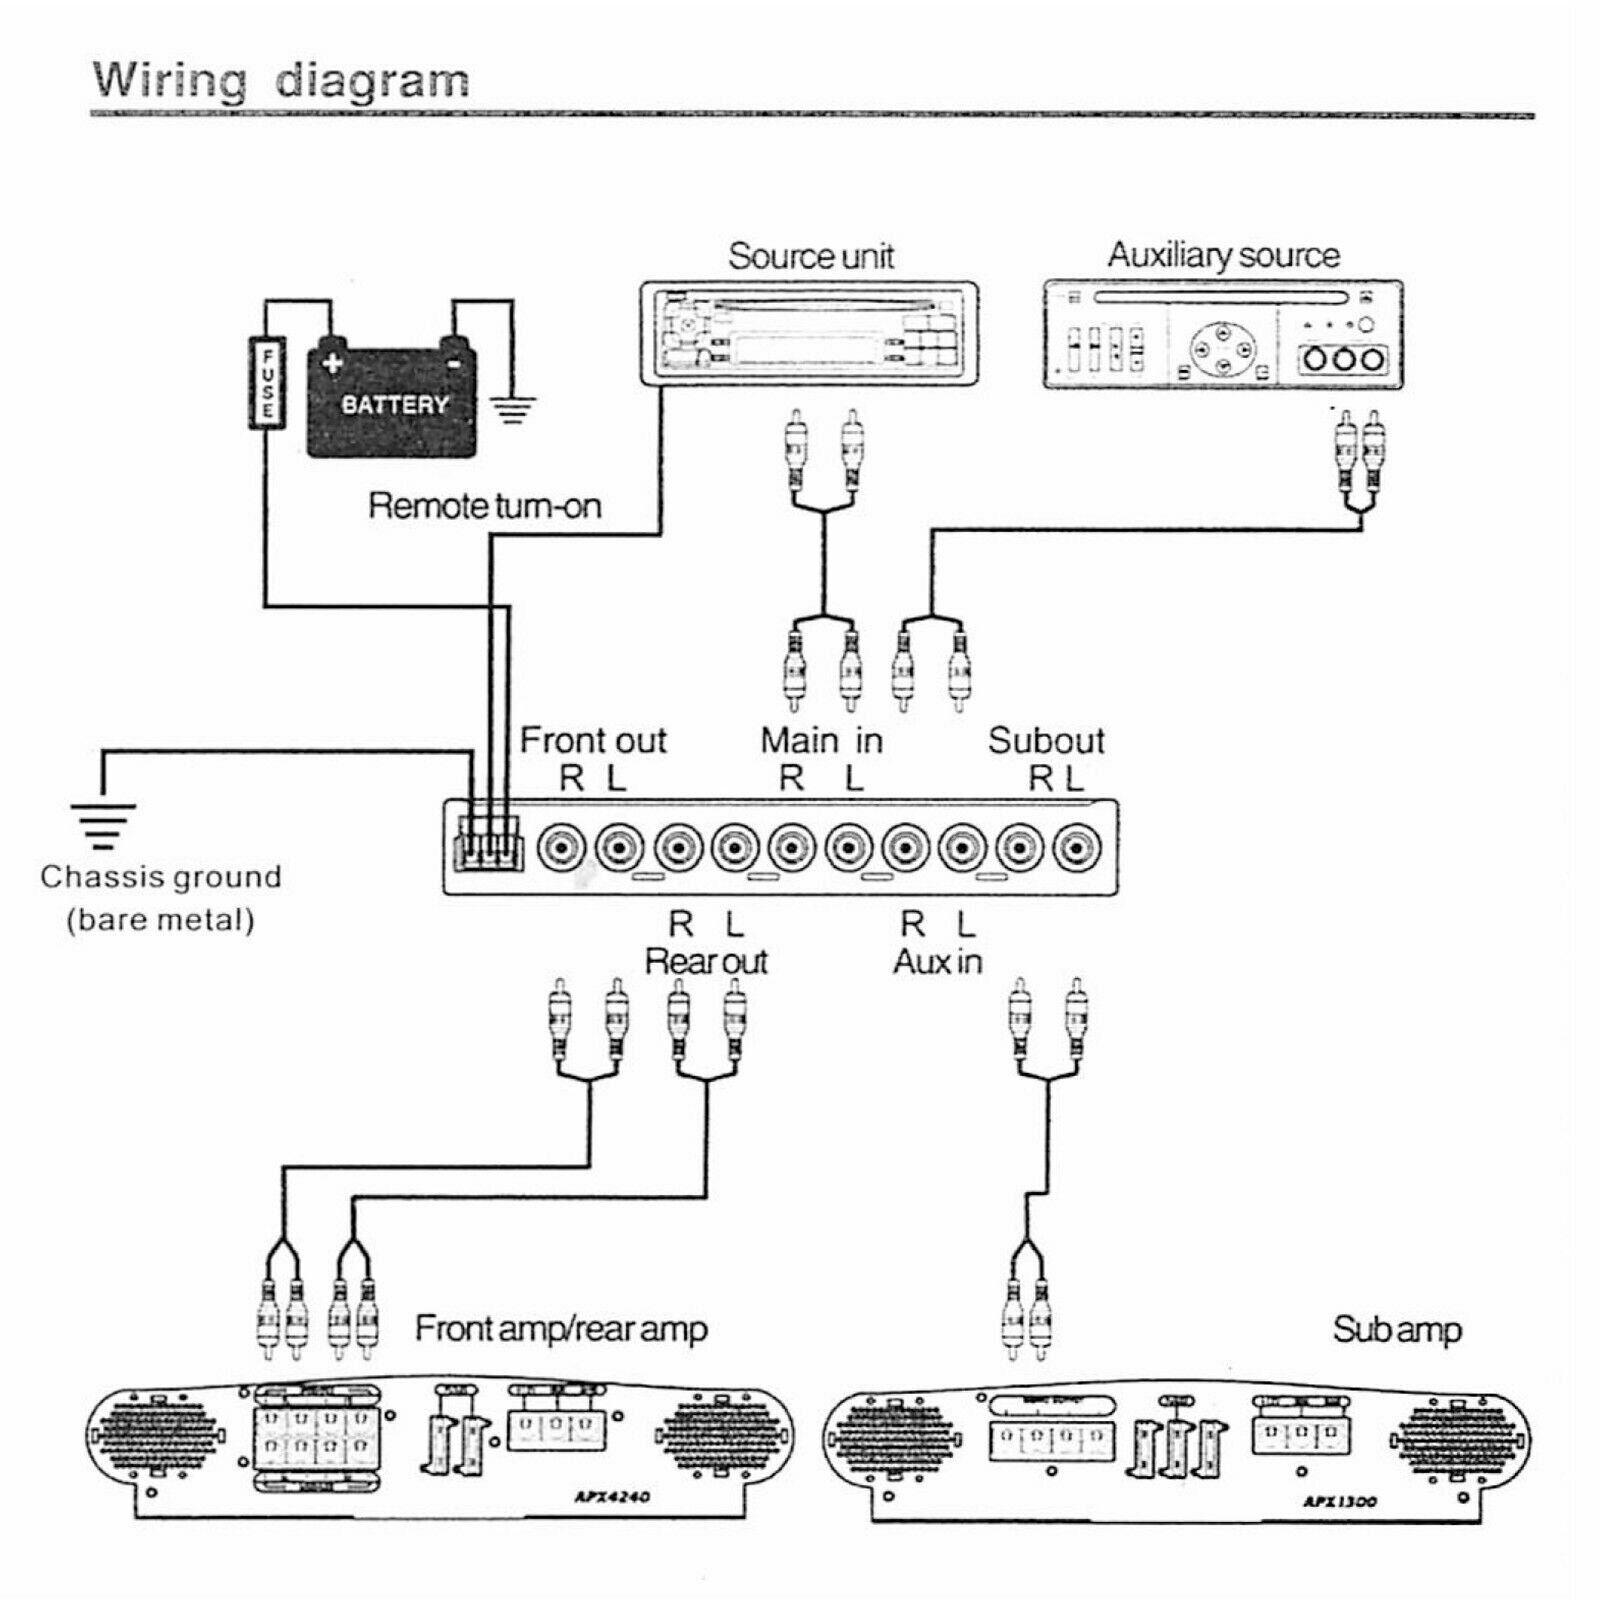 Performance Teknique Wiring Diagram - Furnace Wiring Color Code -  astrany-honda.corolla.waystar.frWiring Diagram Resource